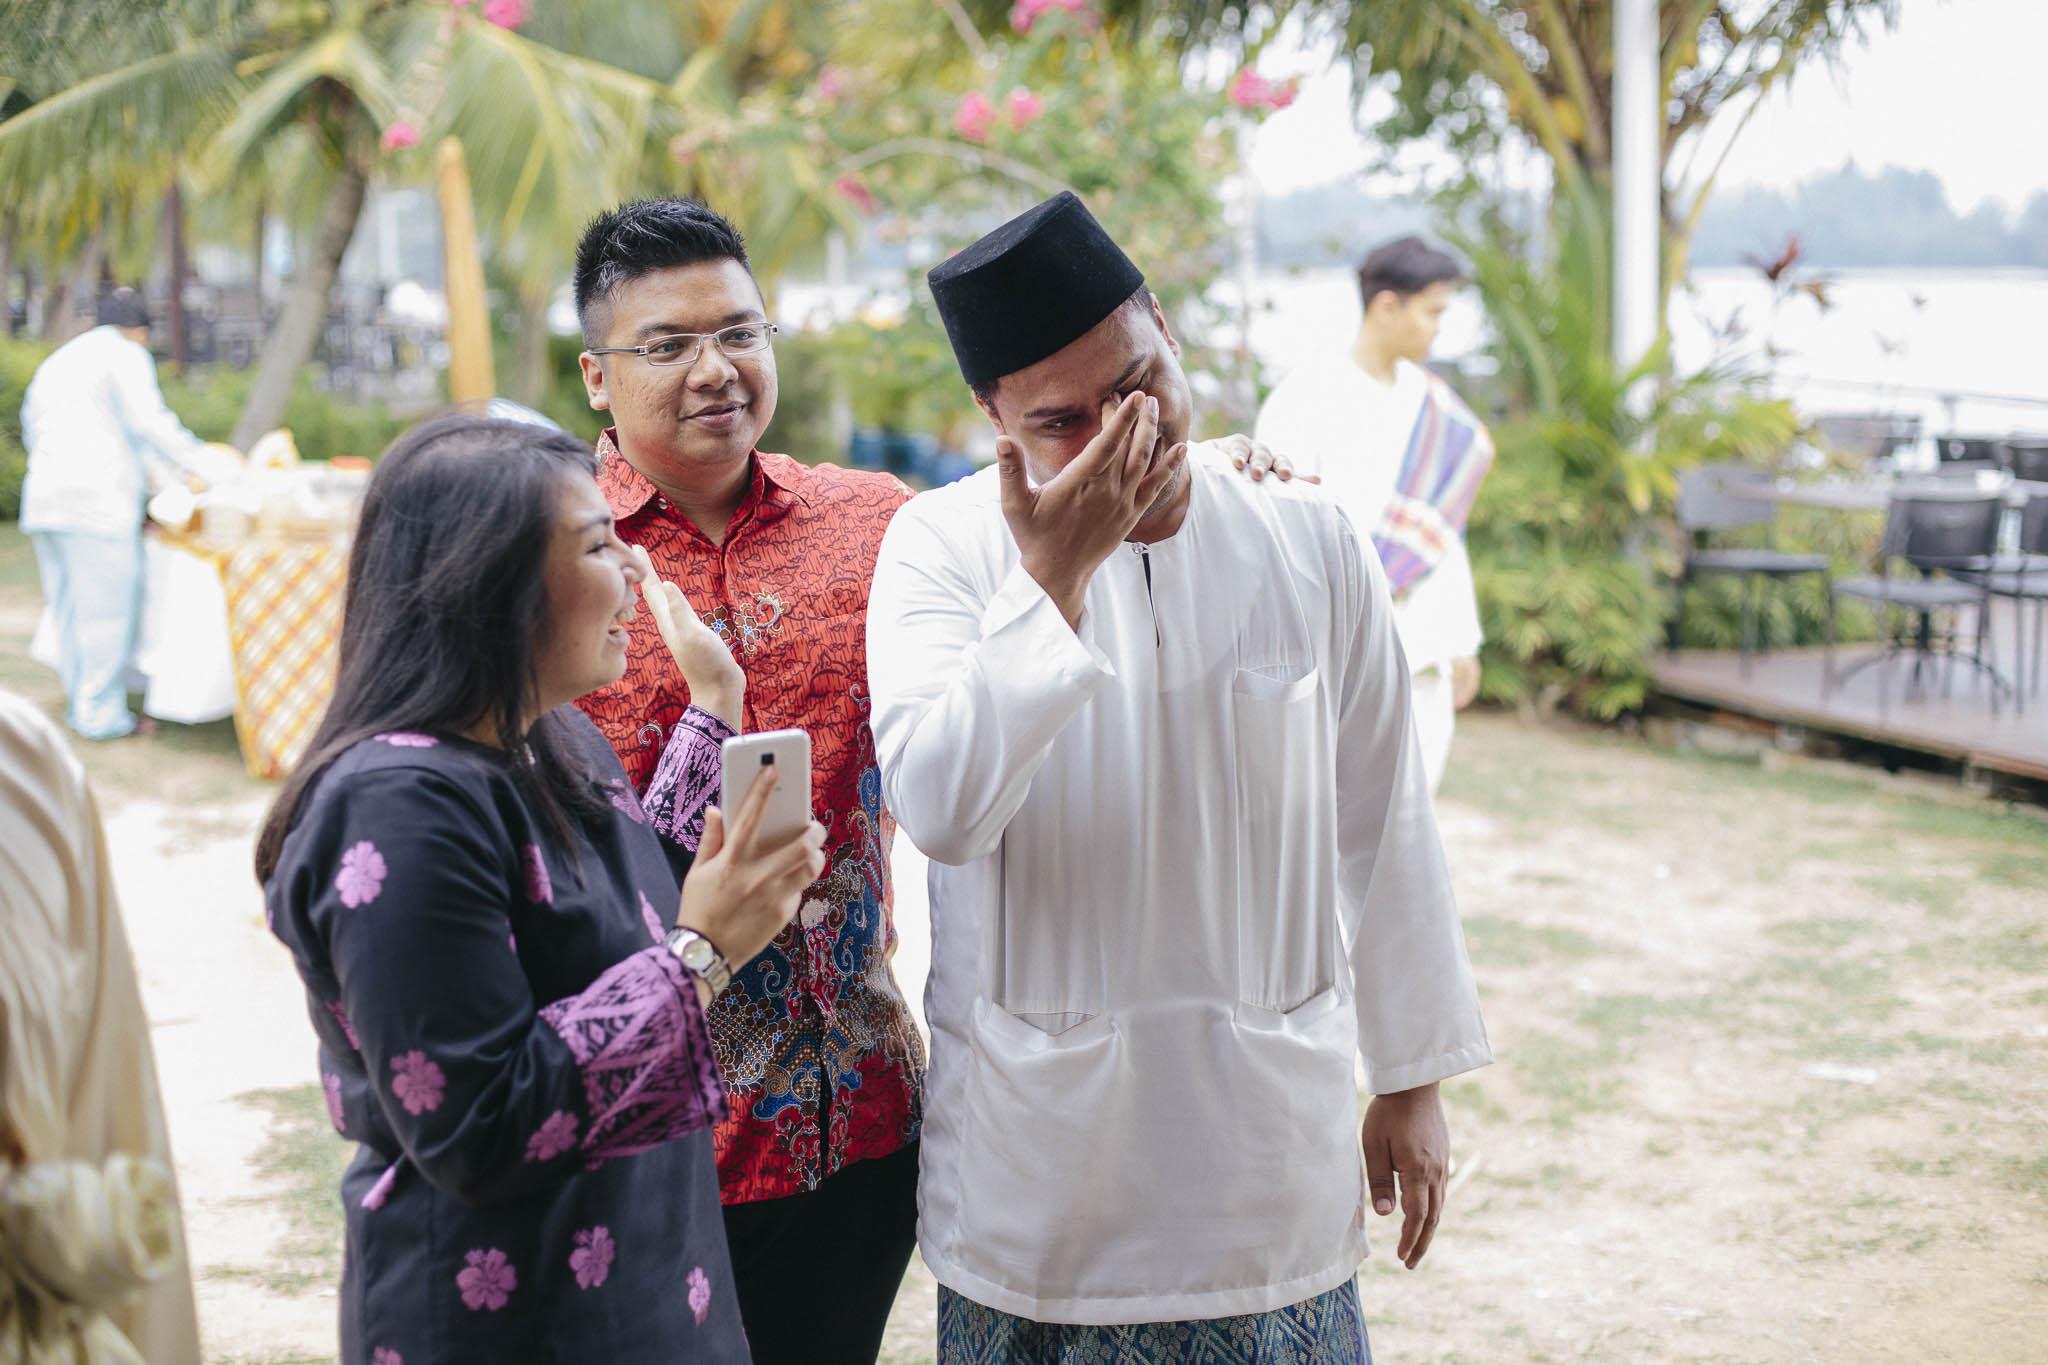 singapore-wedding-photographer-travel-khairul-atikah-63.jpg